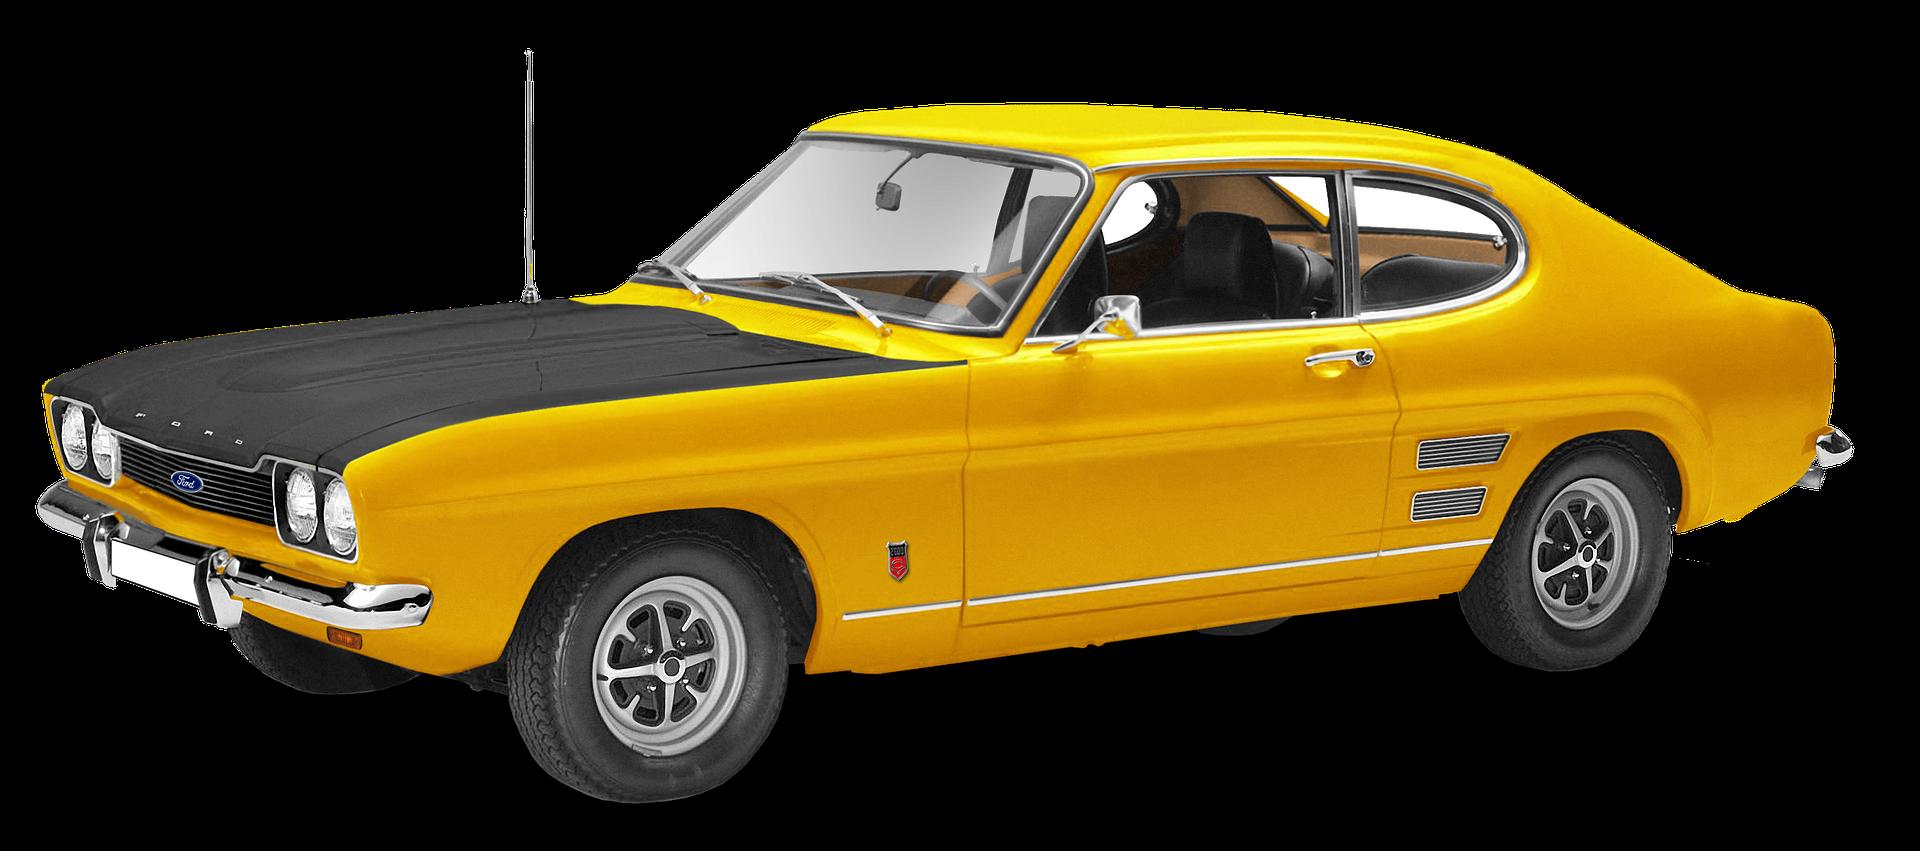 ford-capri-3914333_1920